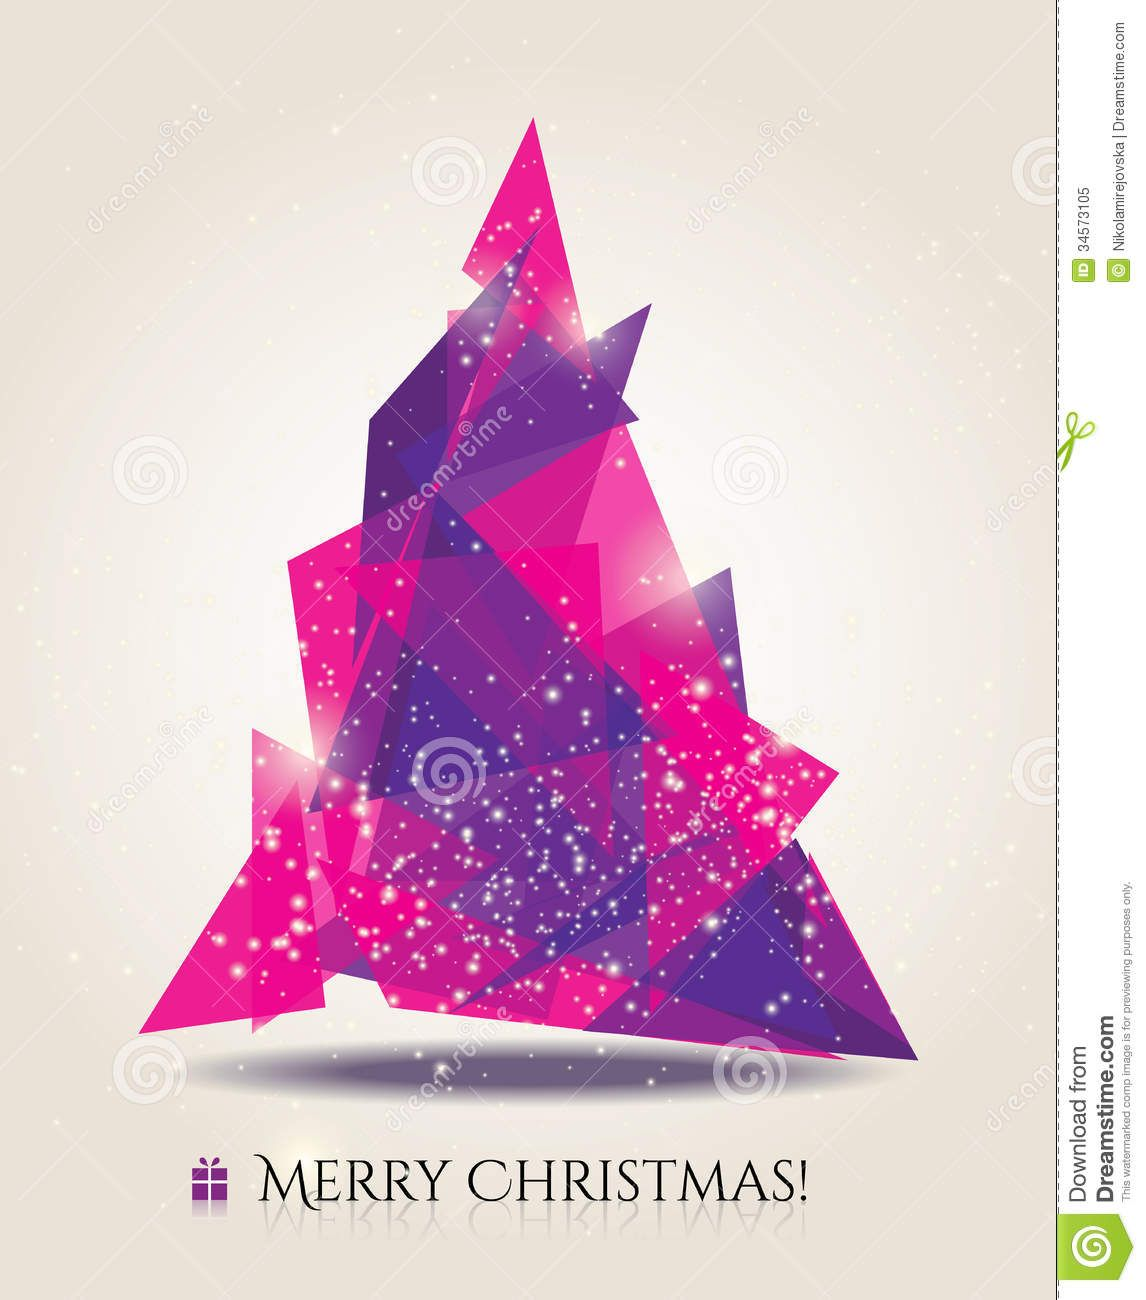 Modern christmas cards 025 03 christmas pinterest Modern christmas